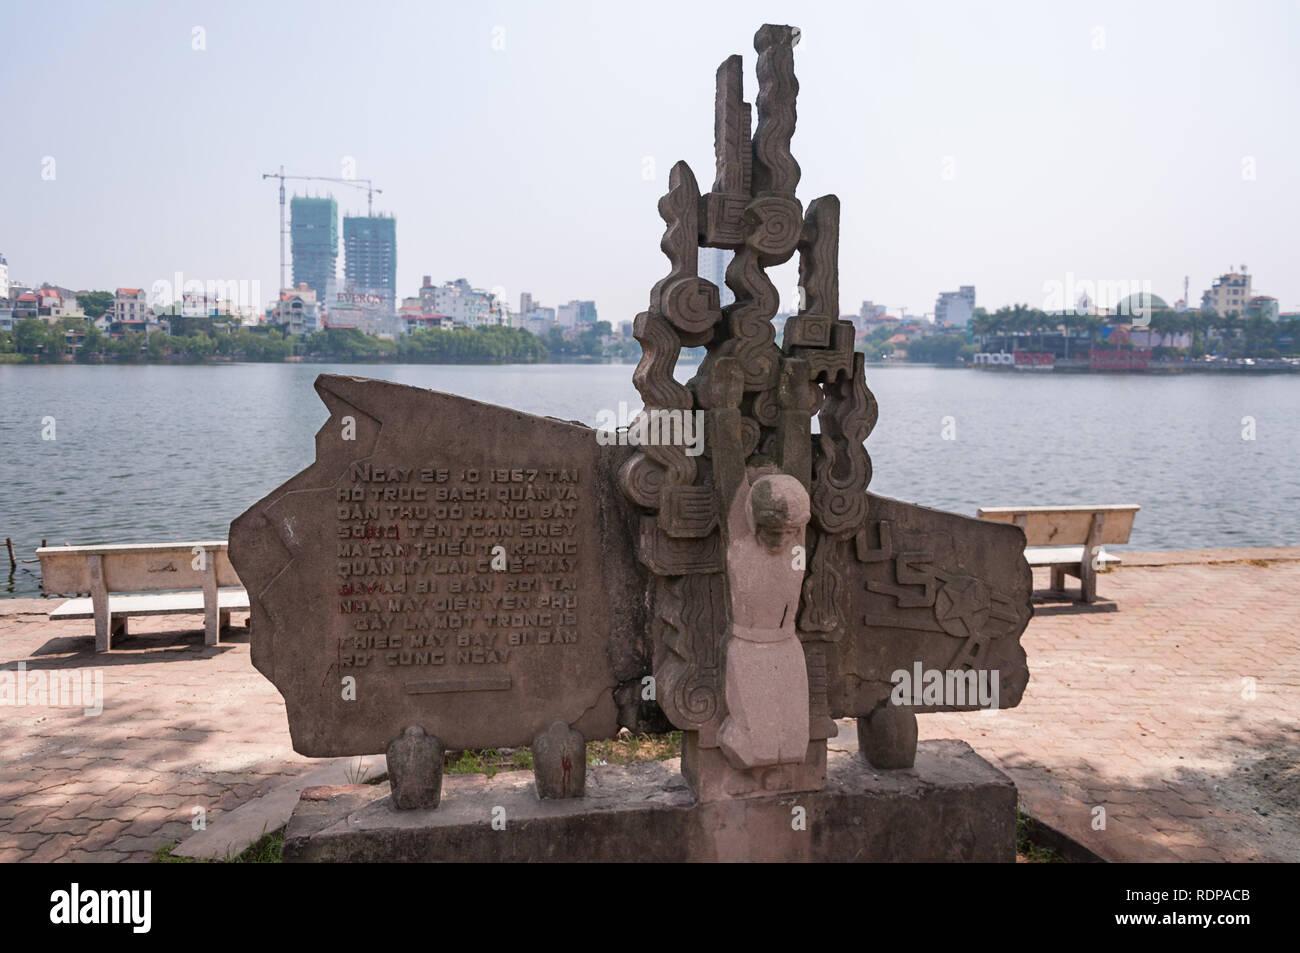 John McCain monument at Trúc Bạch Lake, Hanoi, Vietnam - Stock Image